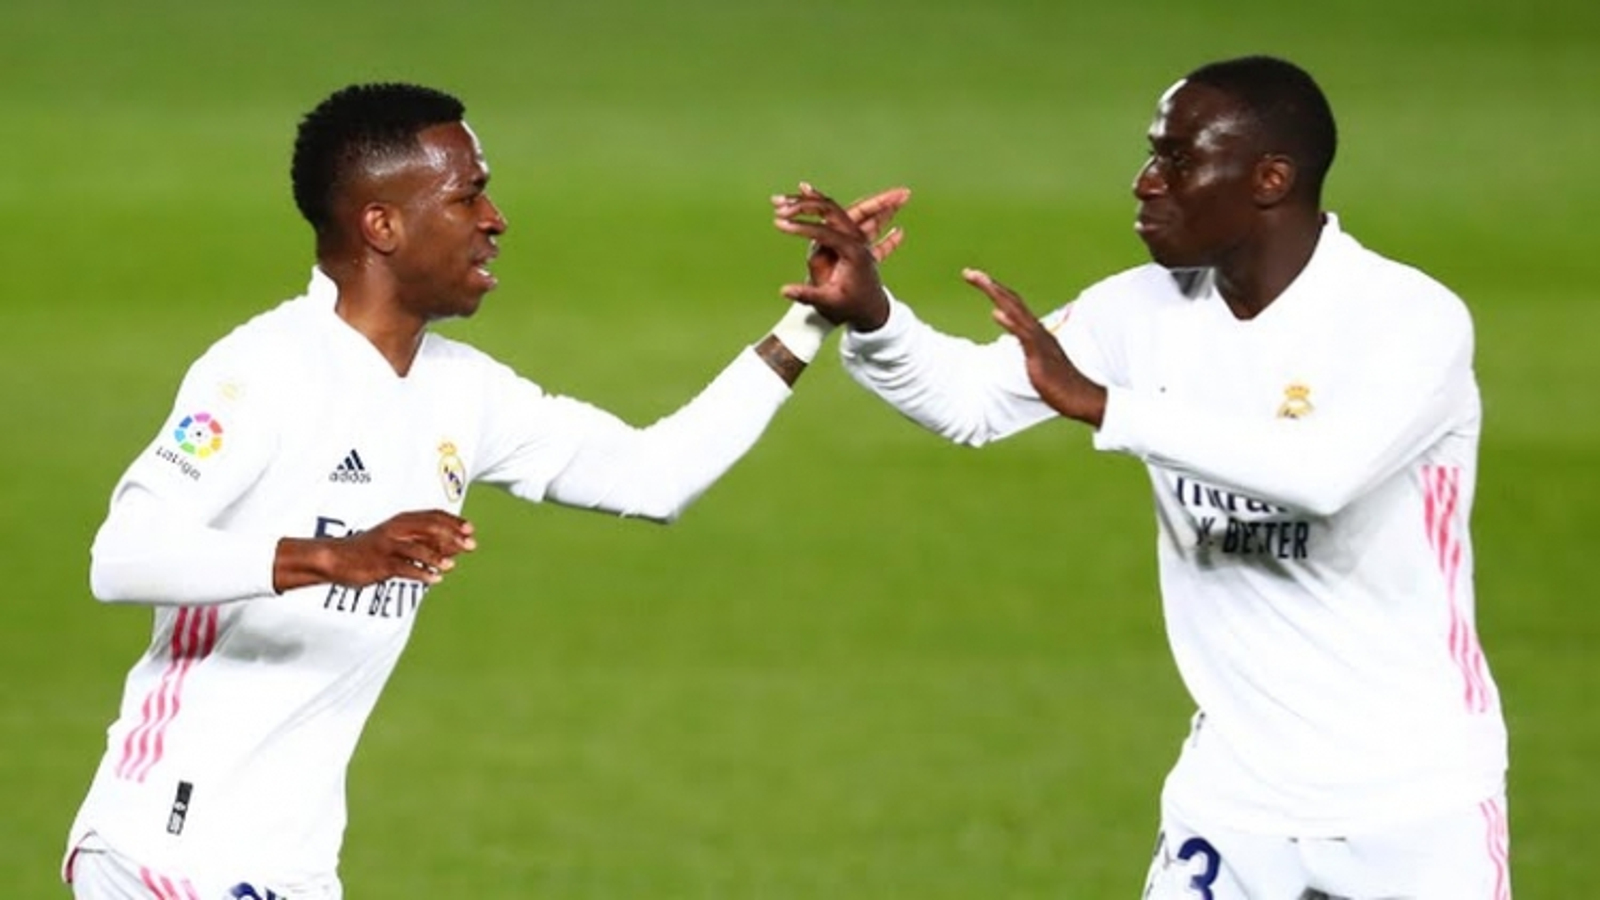 Vinicius Junior ghi bàn phút cuối, Real Madrid thoát thua Sociedad